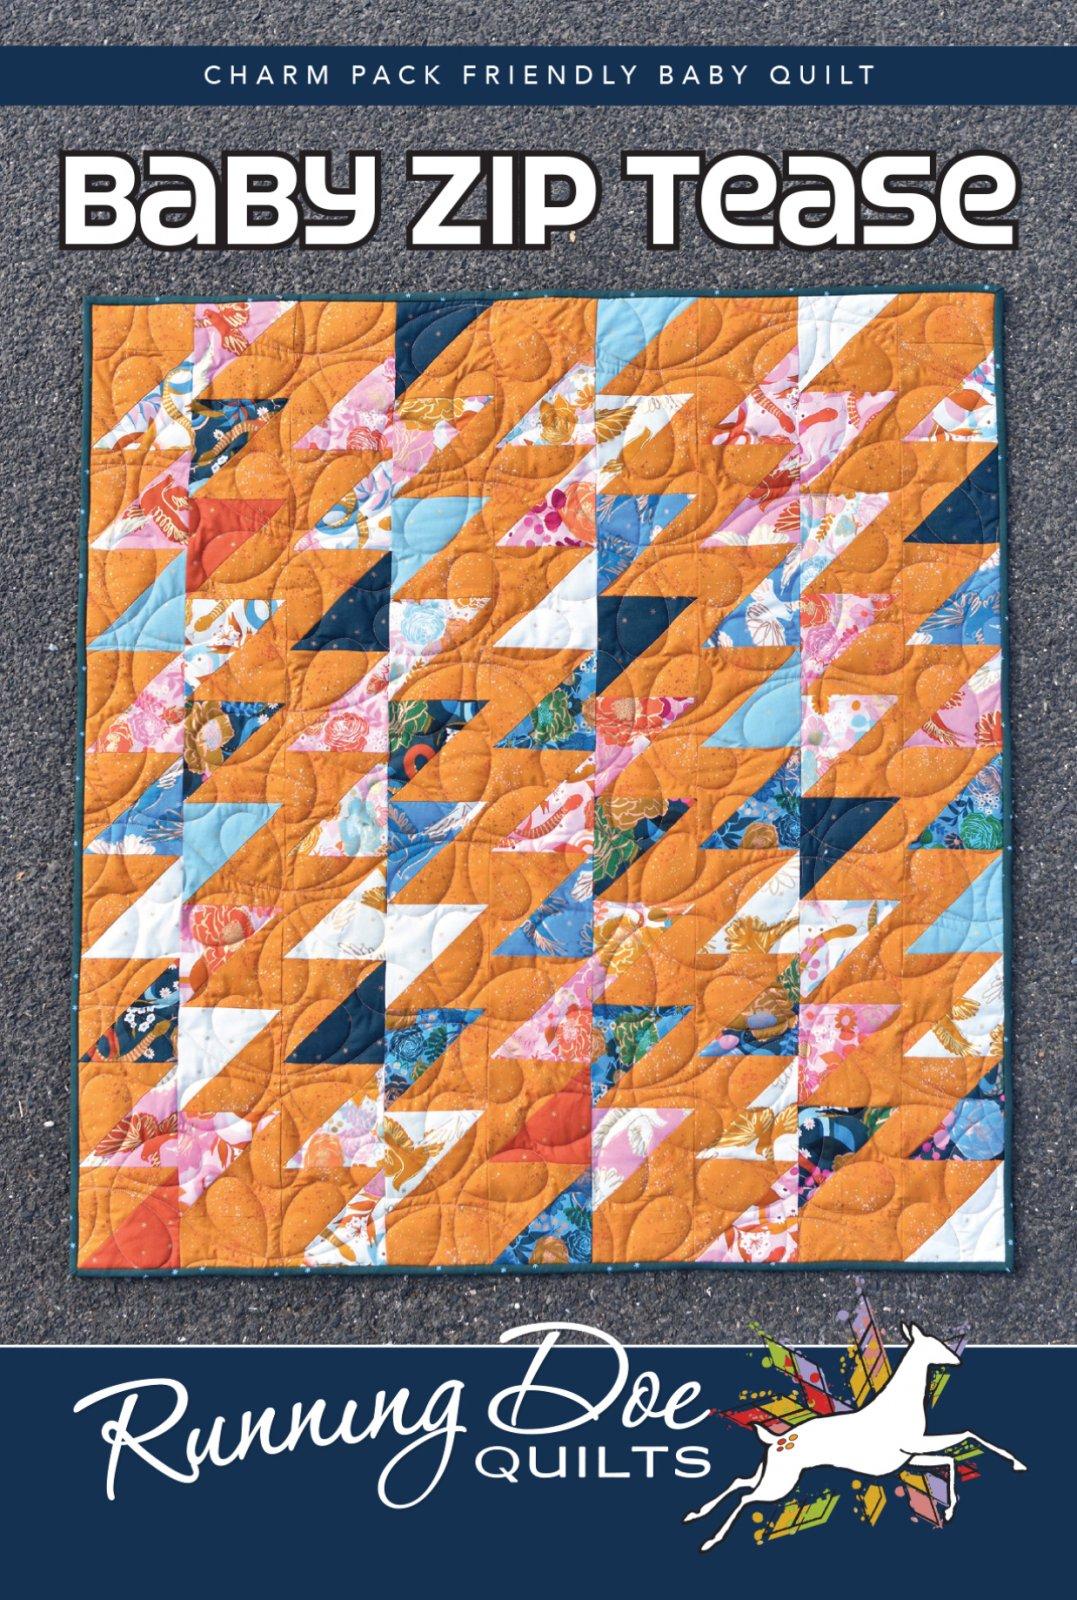 Baby Zip Tease - Villa Rosa - 46 x 61 - Theme/Yardage